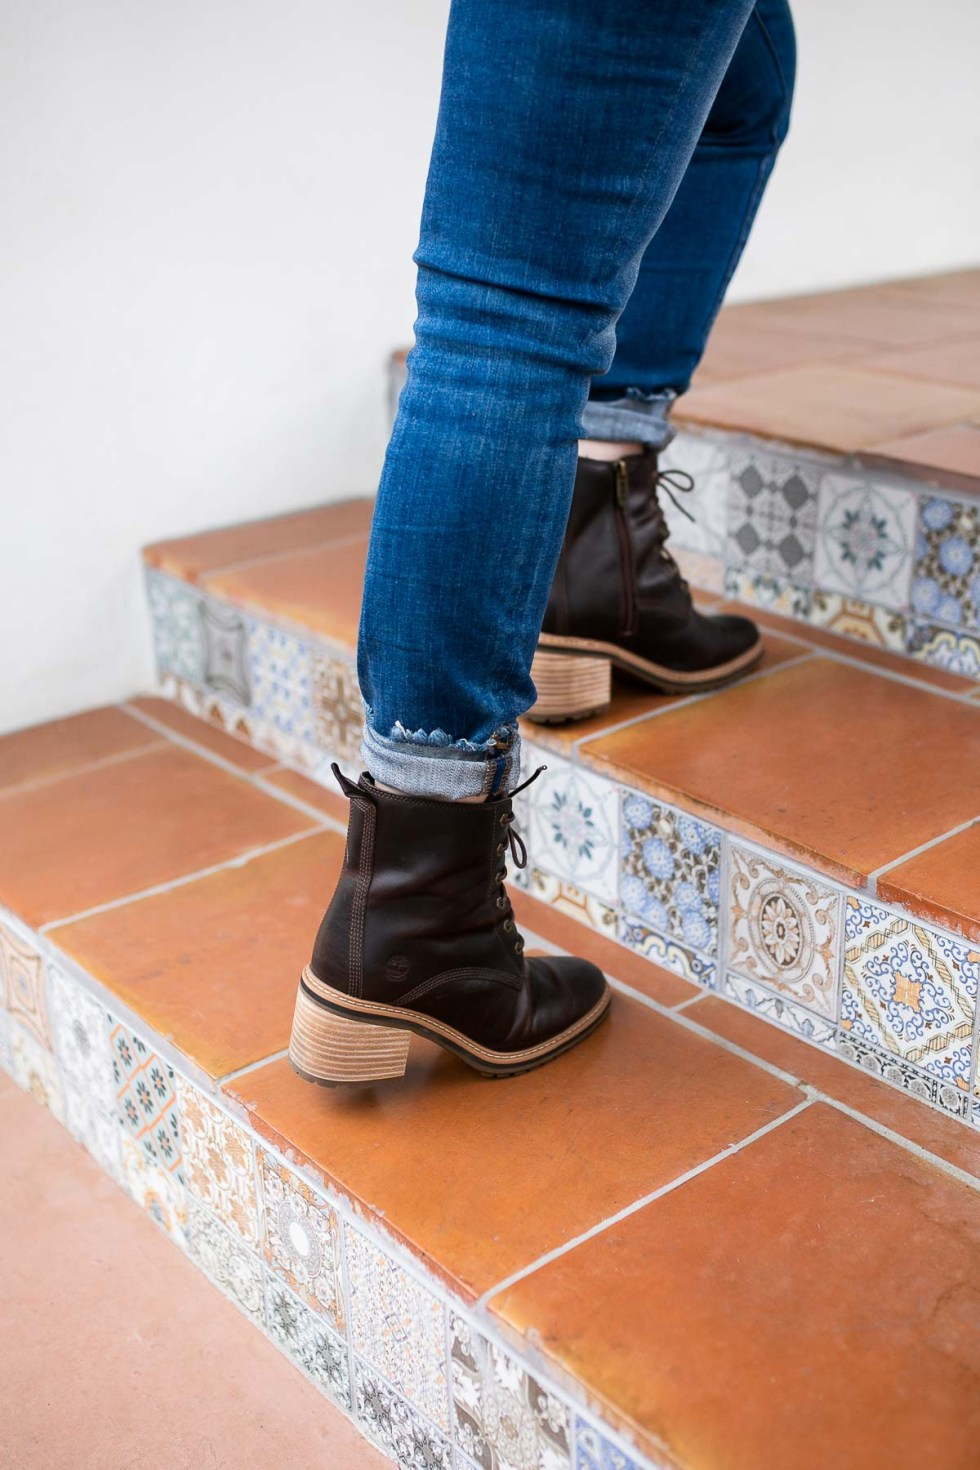 Heeled Timberland Women's Boots + DL1961 Denim Review